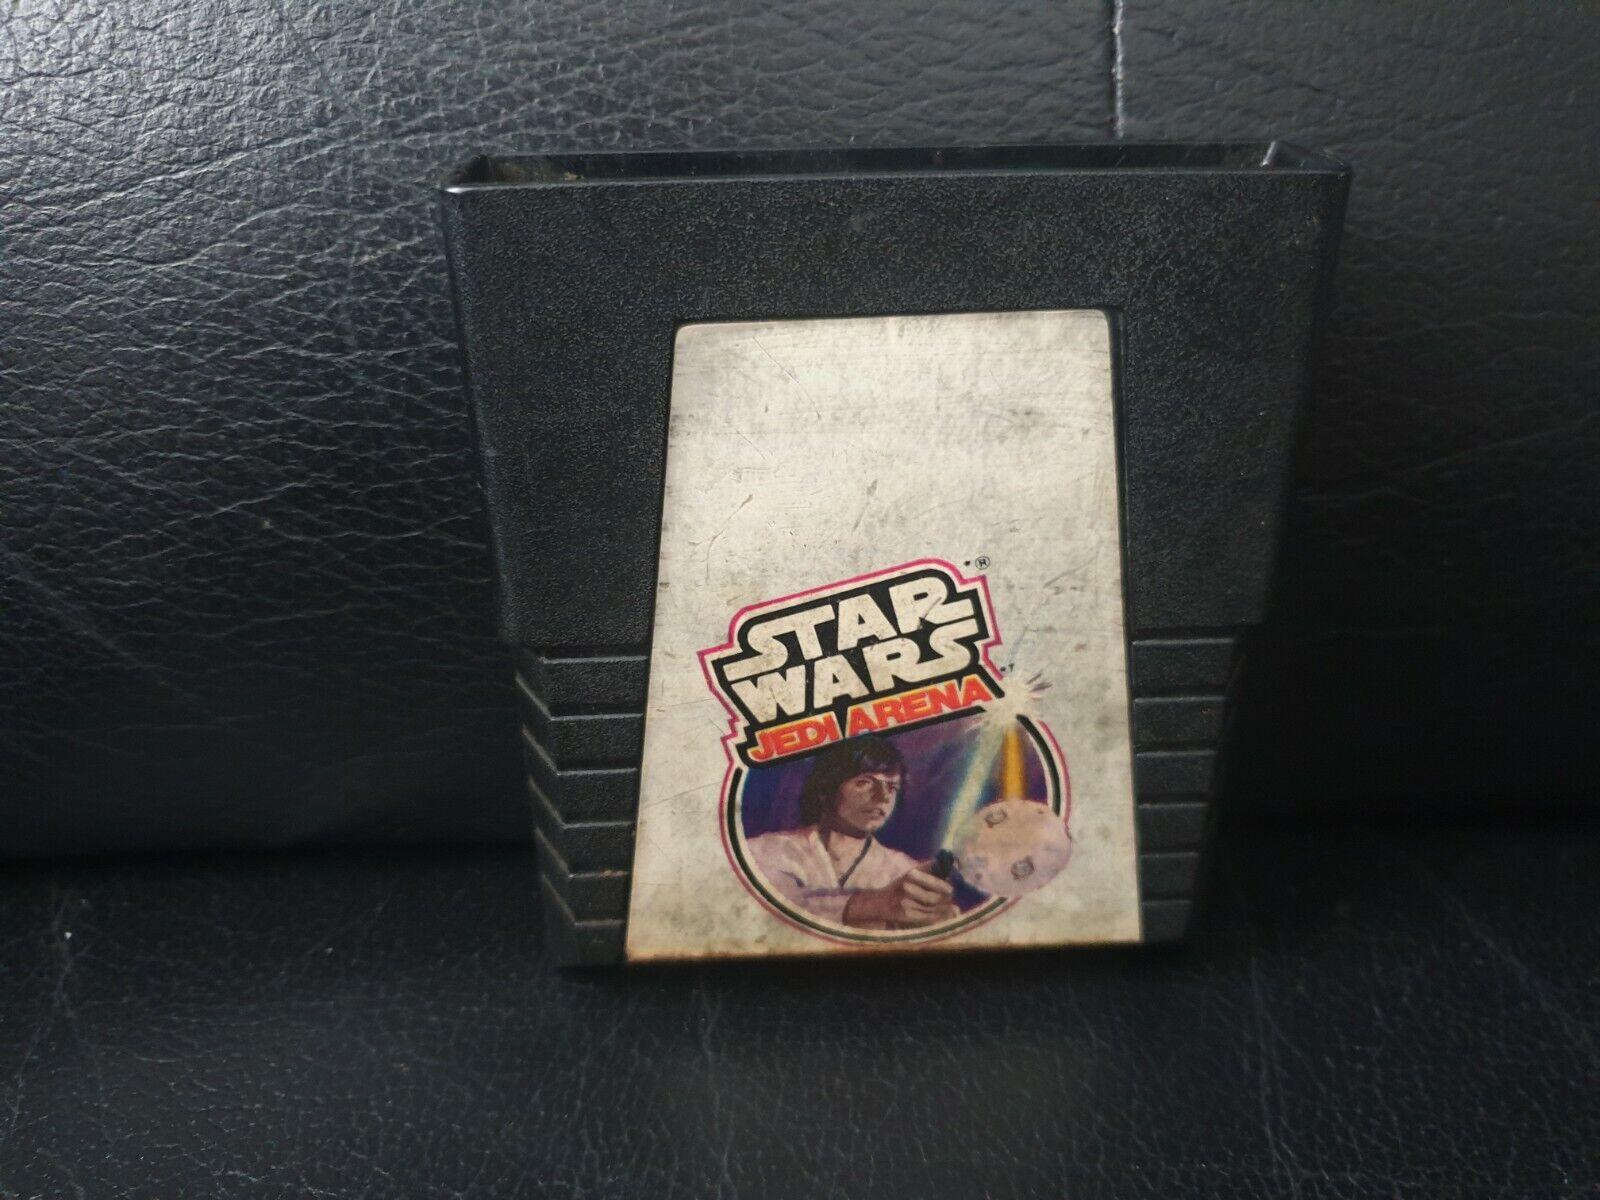 Star Wars: Jedi Arena, Atari 2600/7800 Game, - jeu StarWars